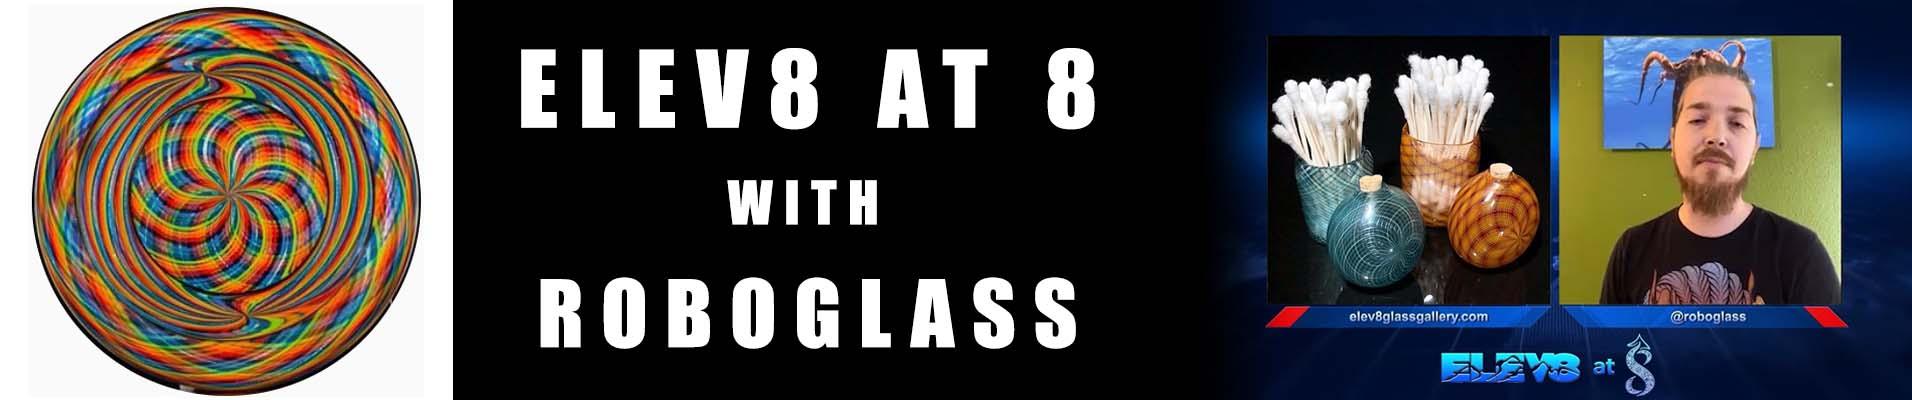 roboglass-elev8-at-8-banner.jpg